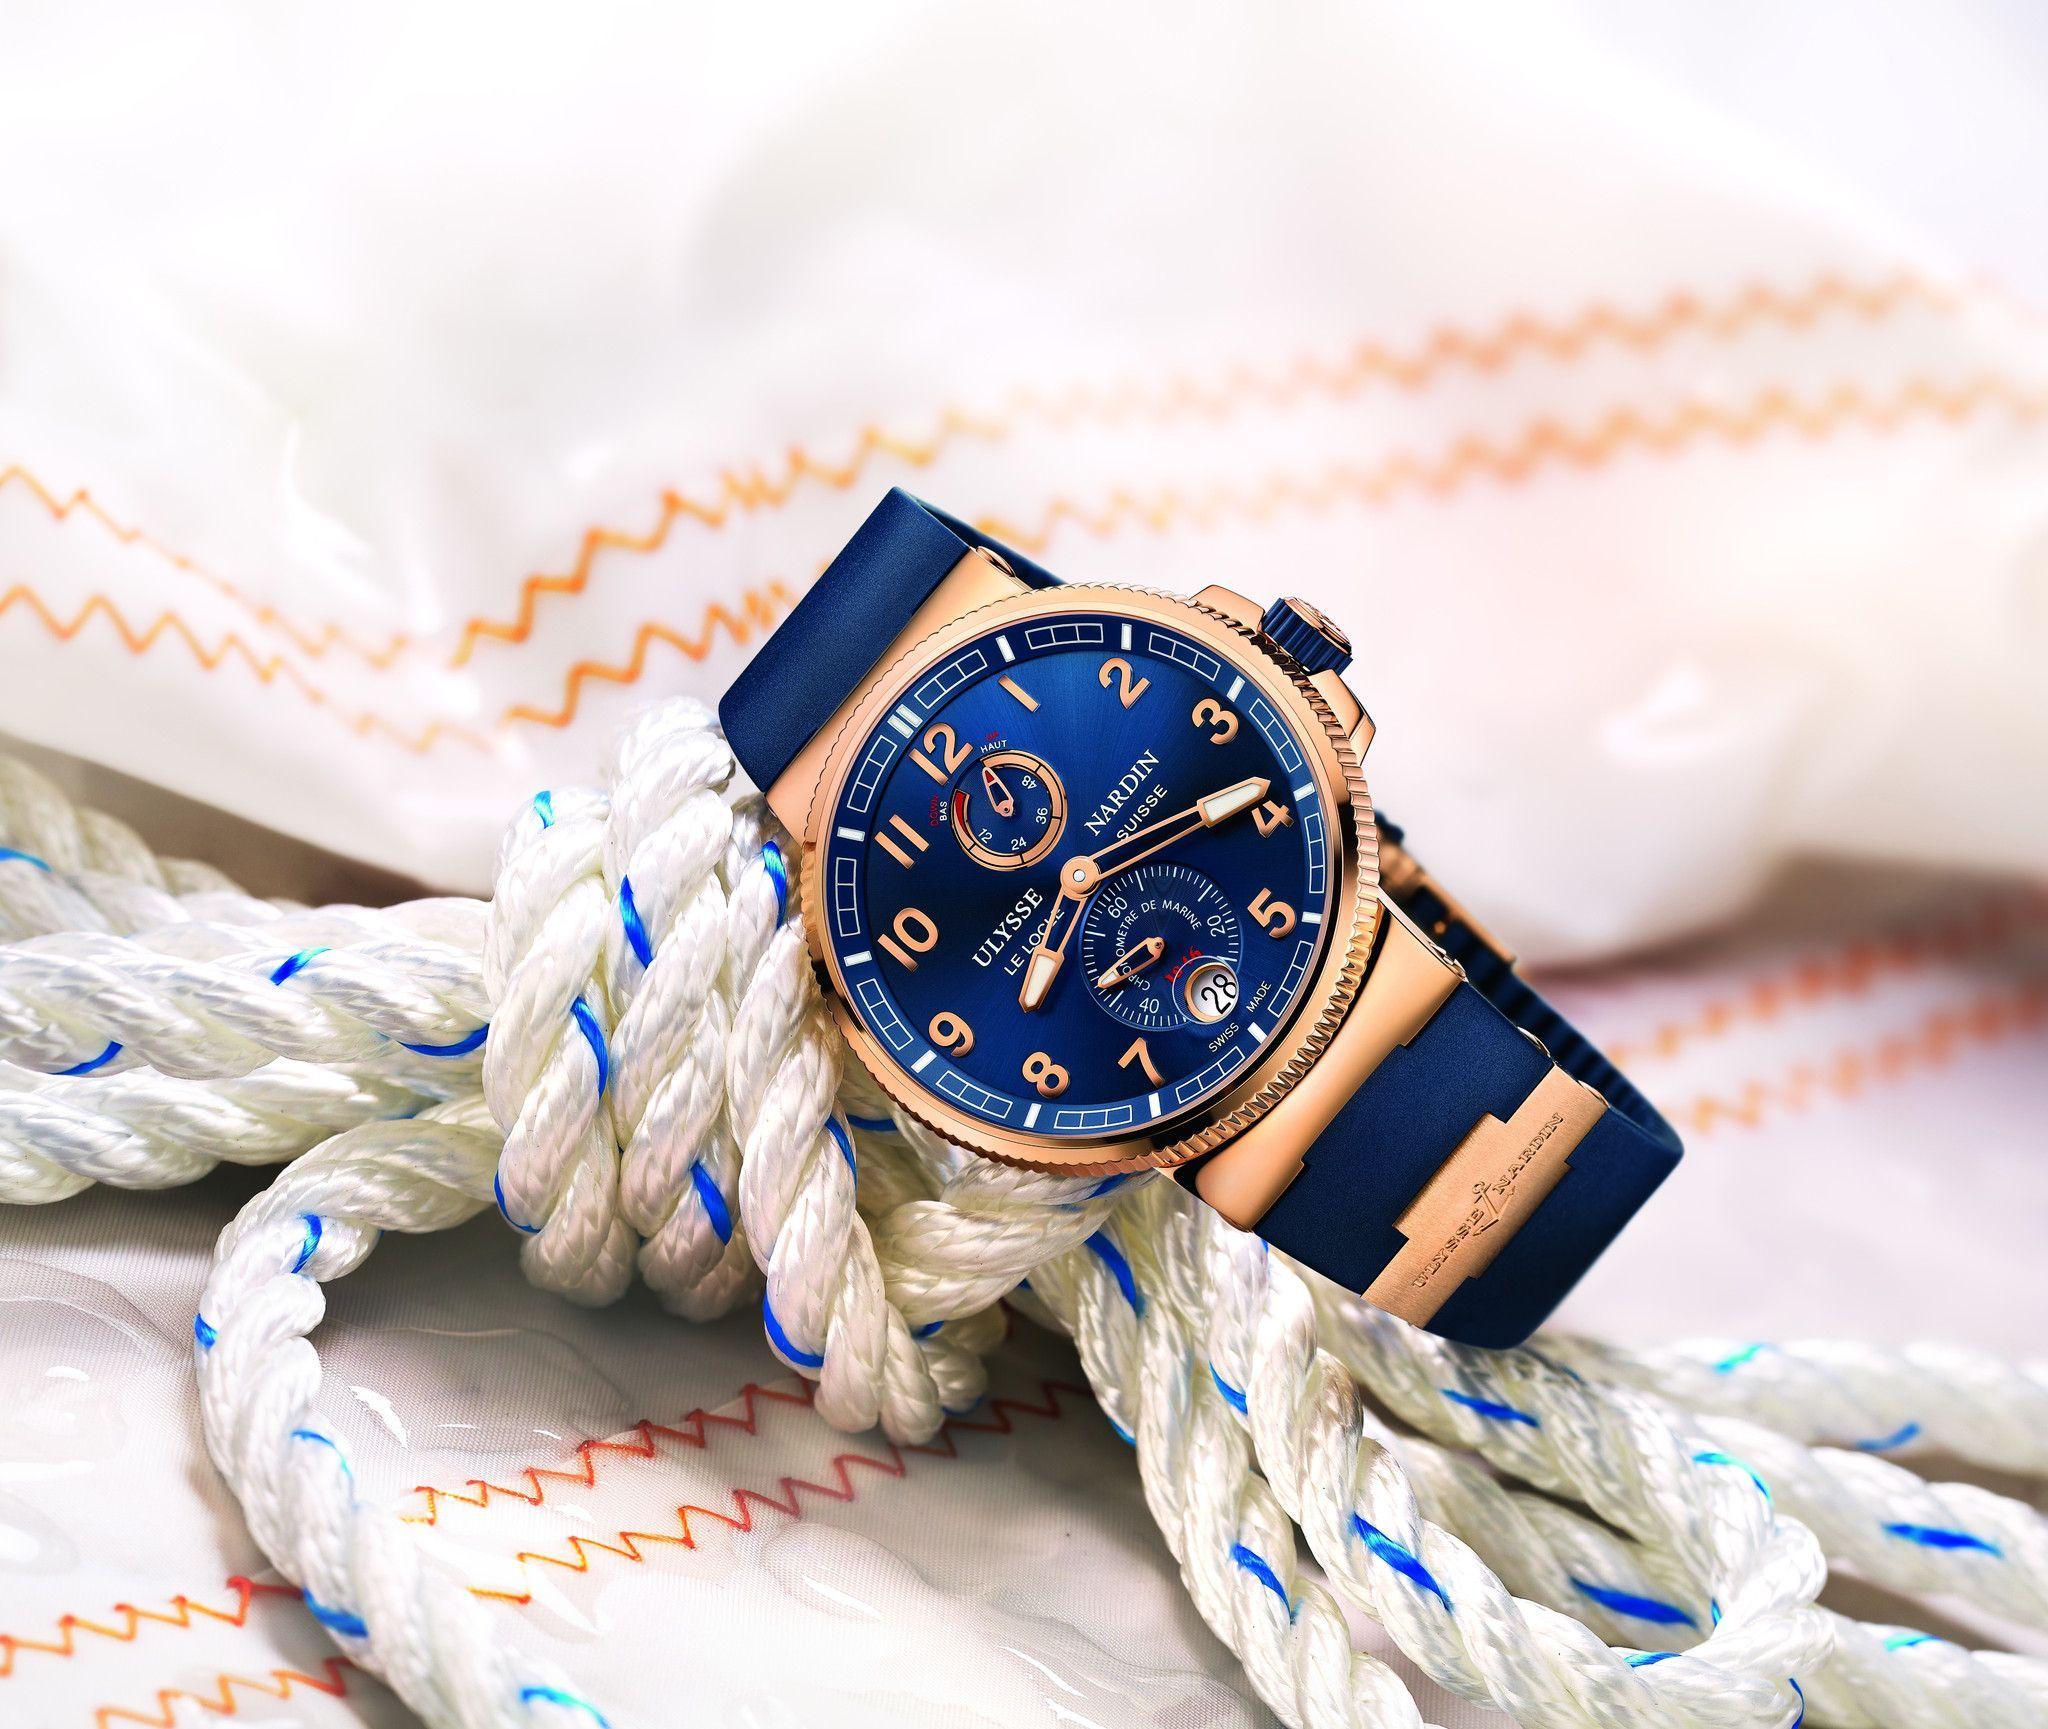 Ulysse Nardin Marine Chronometer Manufacture Ulyssenardin Lux Luxurywatches Reloj Vintage Reloj Estilo Marinero